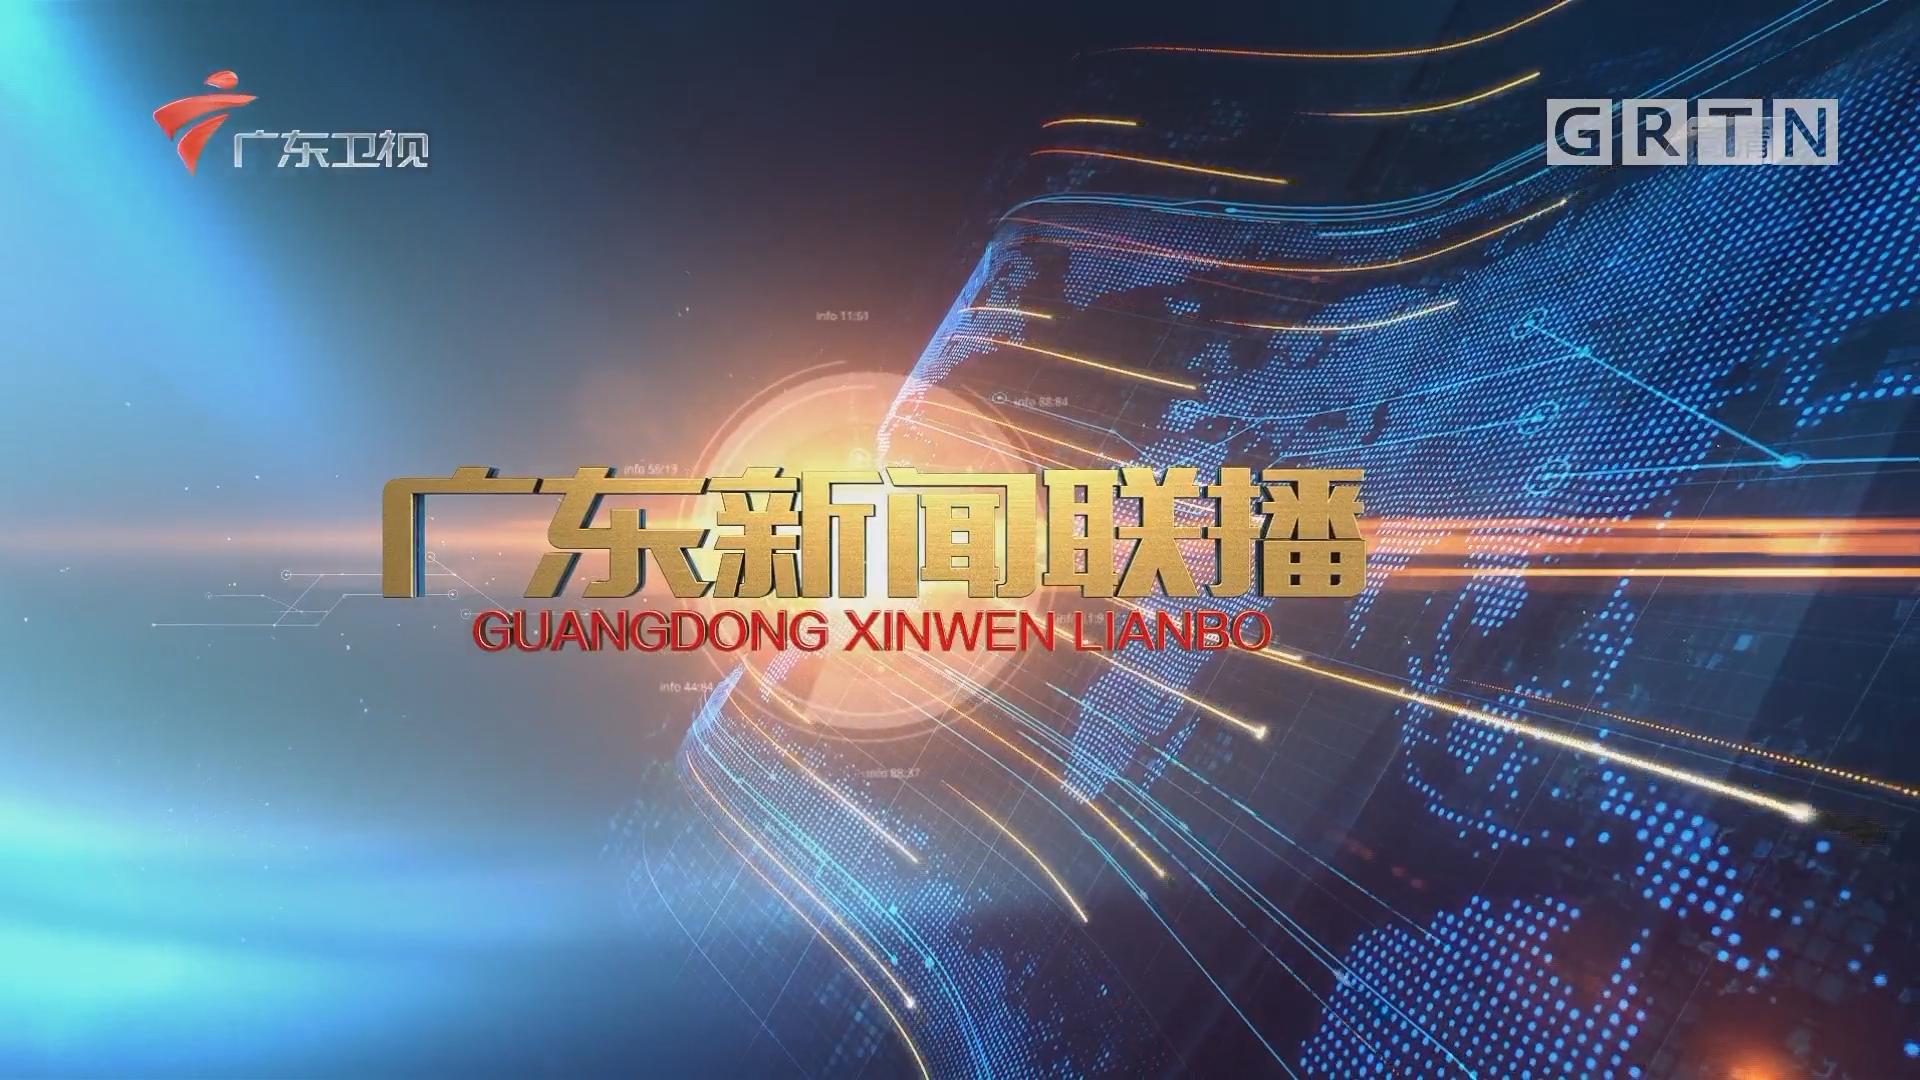 [HD][2018-03-13]广东新闻联播十三届全国人大一次会议举行第四次全体会议